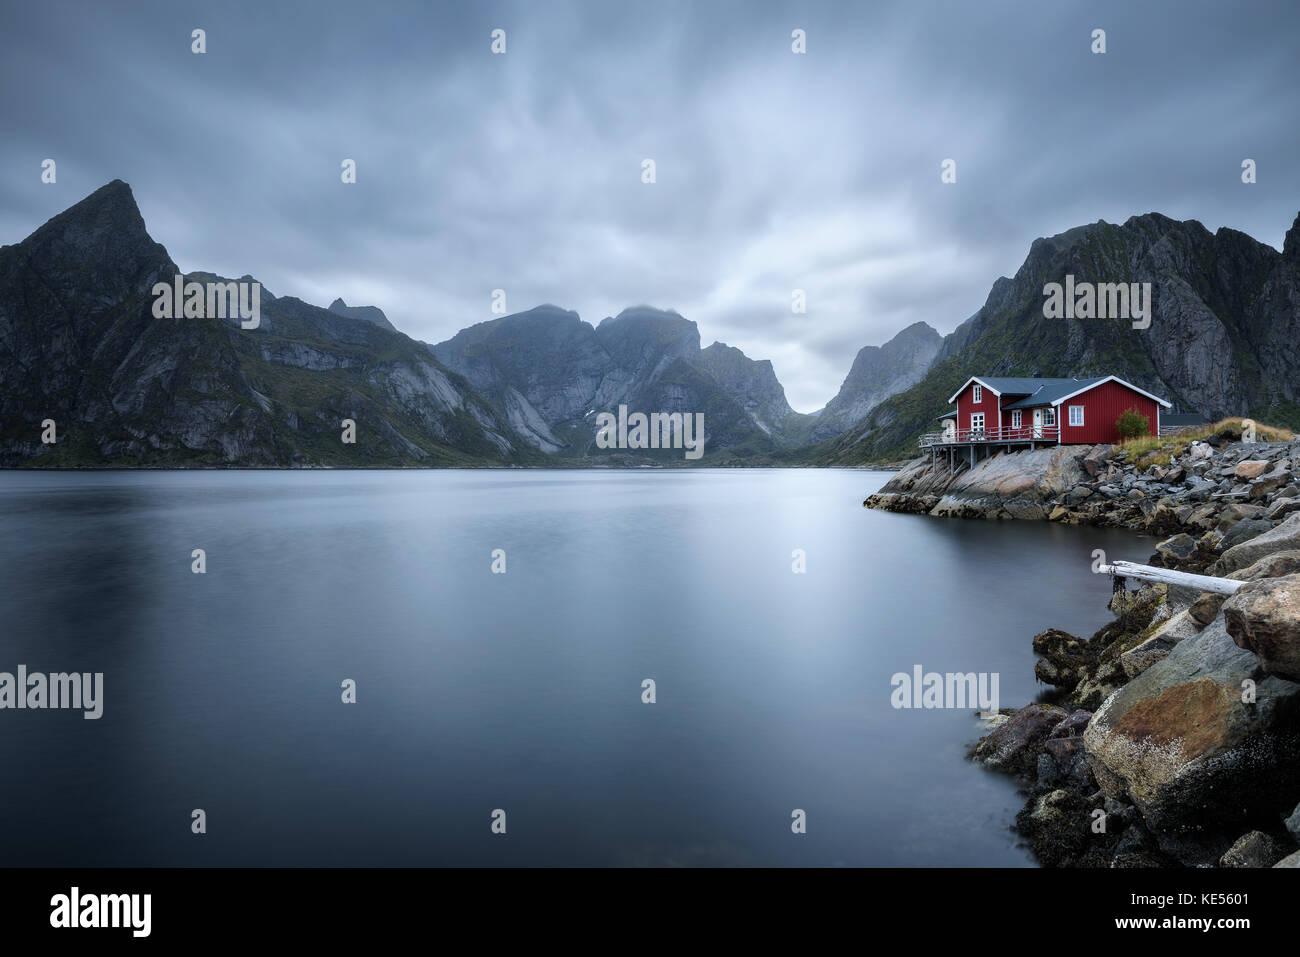 Traditionelles rotes rorbu Ferienhaus in Dorf, hamnoy Lofoten Inseln, Norwegen Stockfoto